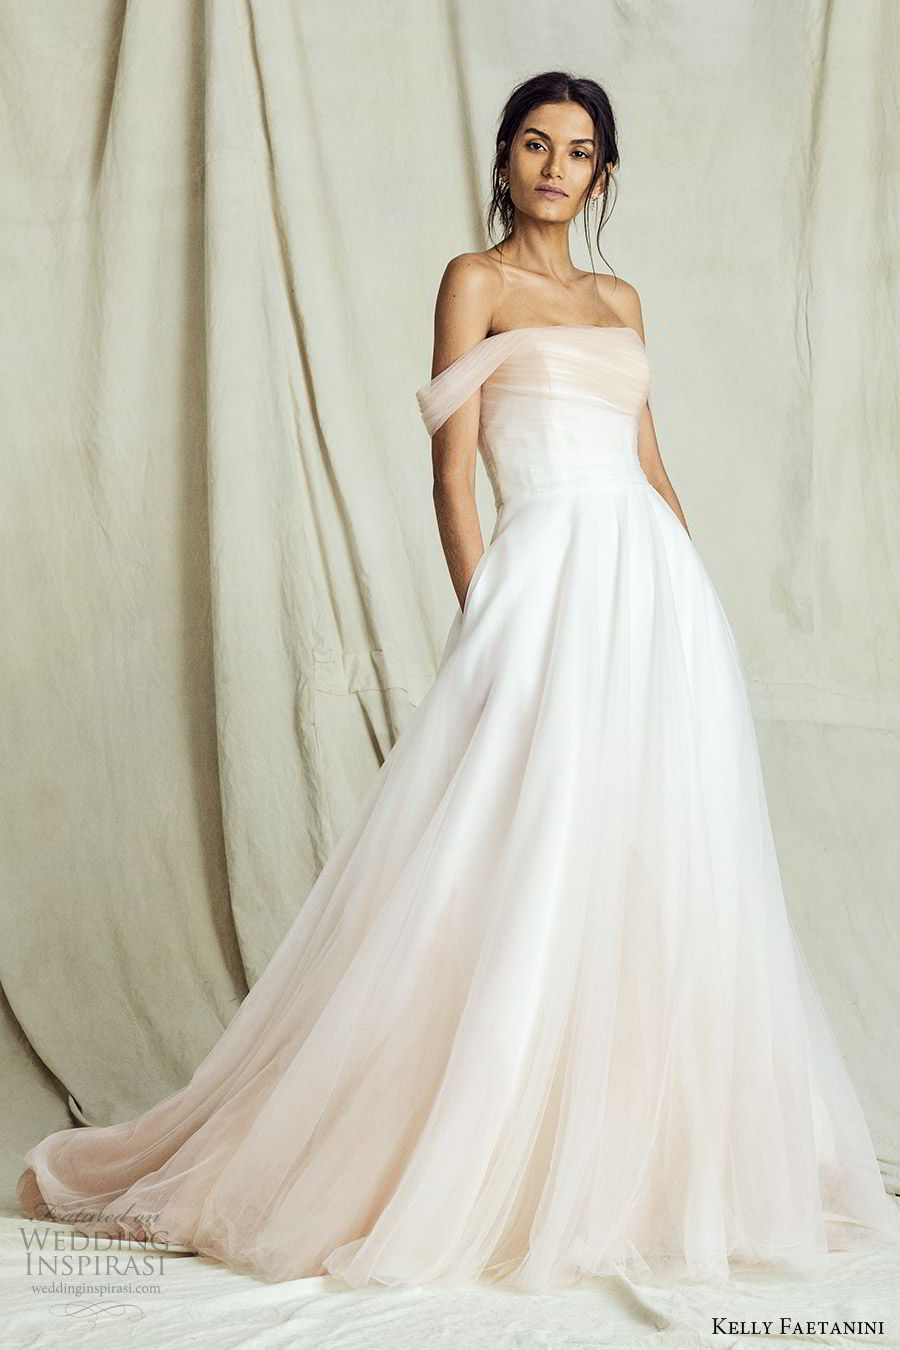 kelly faetanini fall 2019 bridal off shoulder straight across neckline ruched bodice a line ball gown wedding dress elegant romantic ombre blush chapel train (11) mv